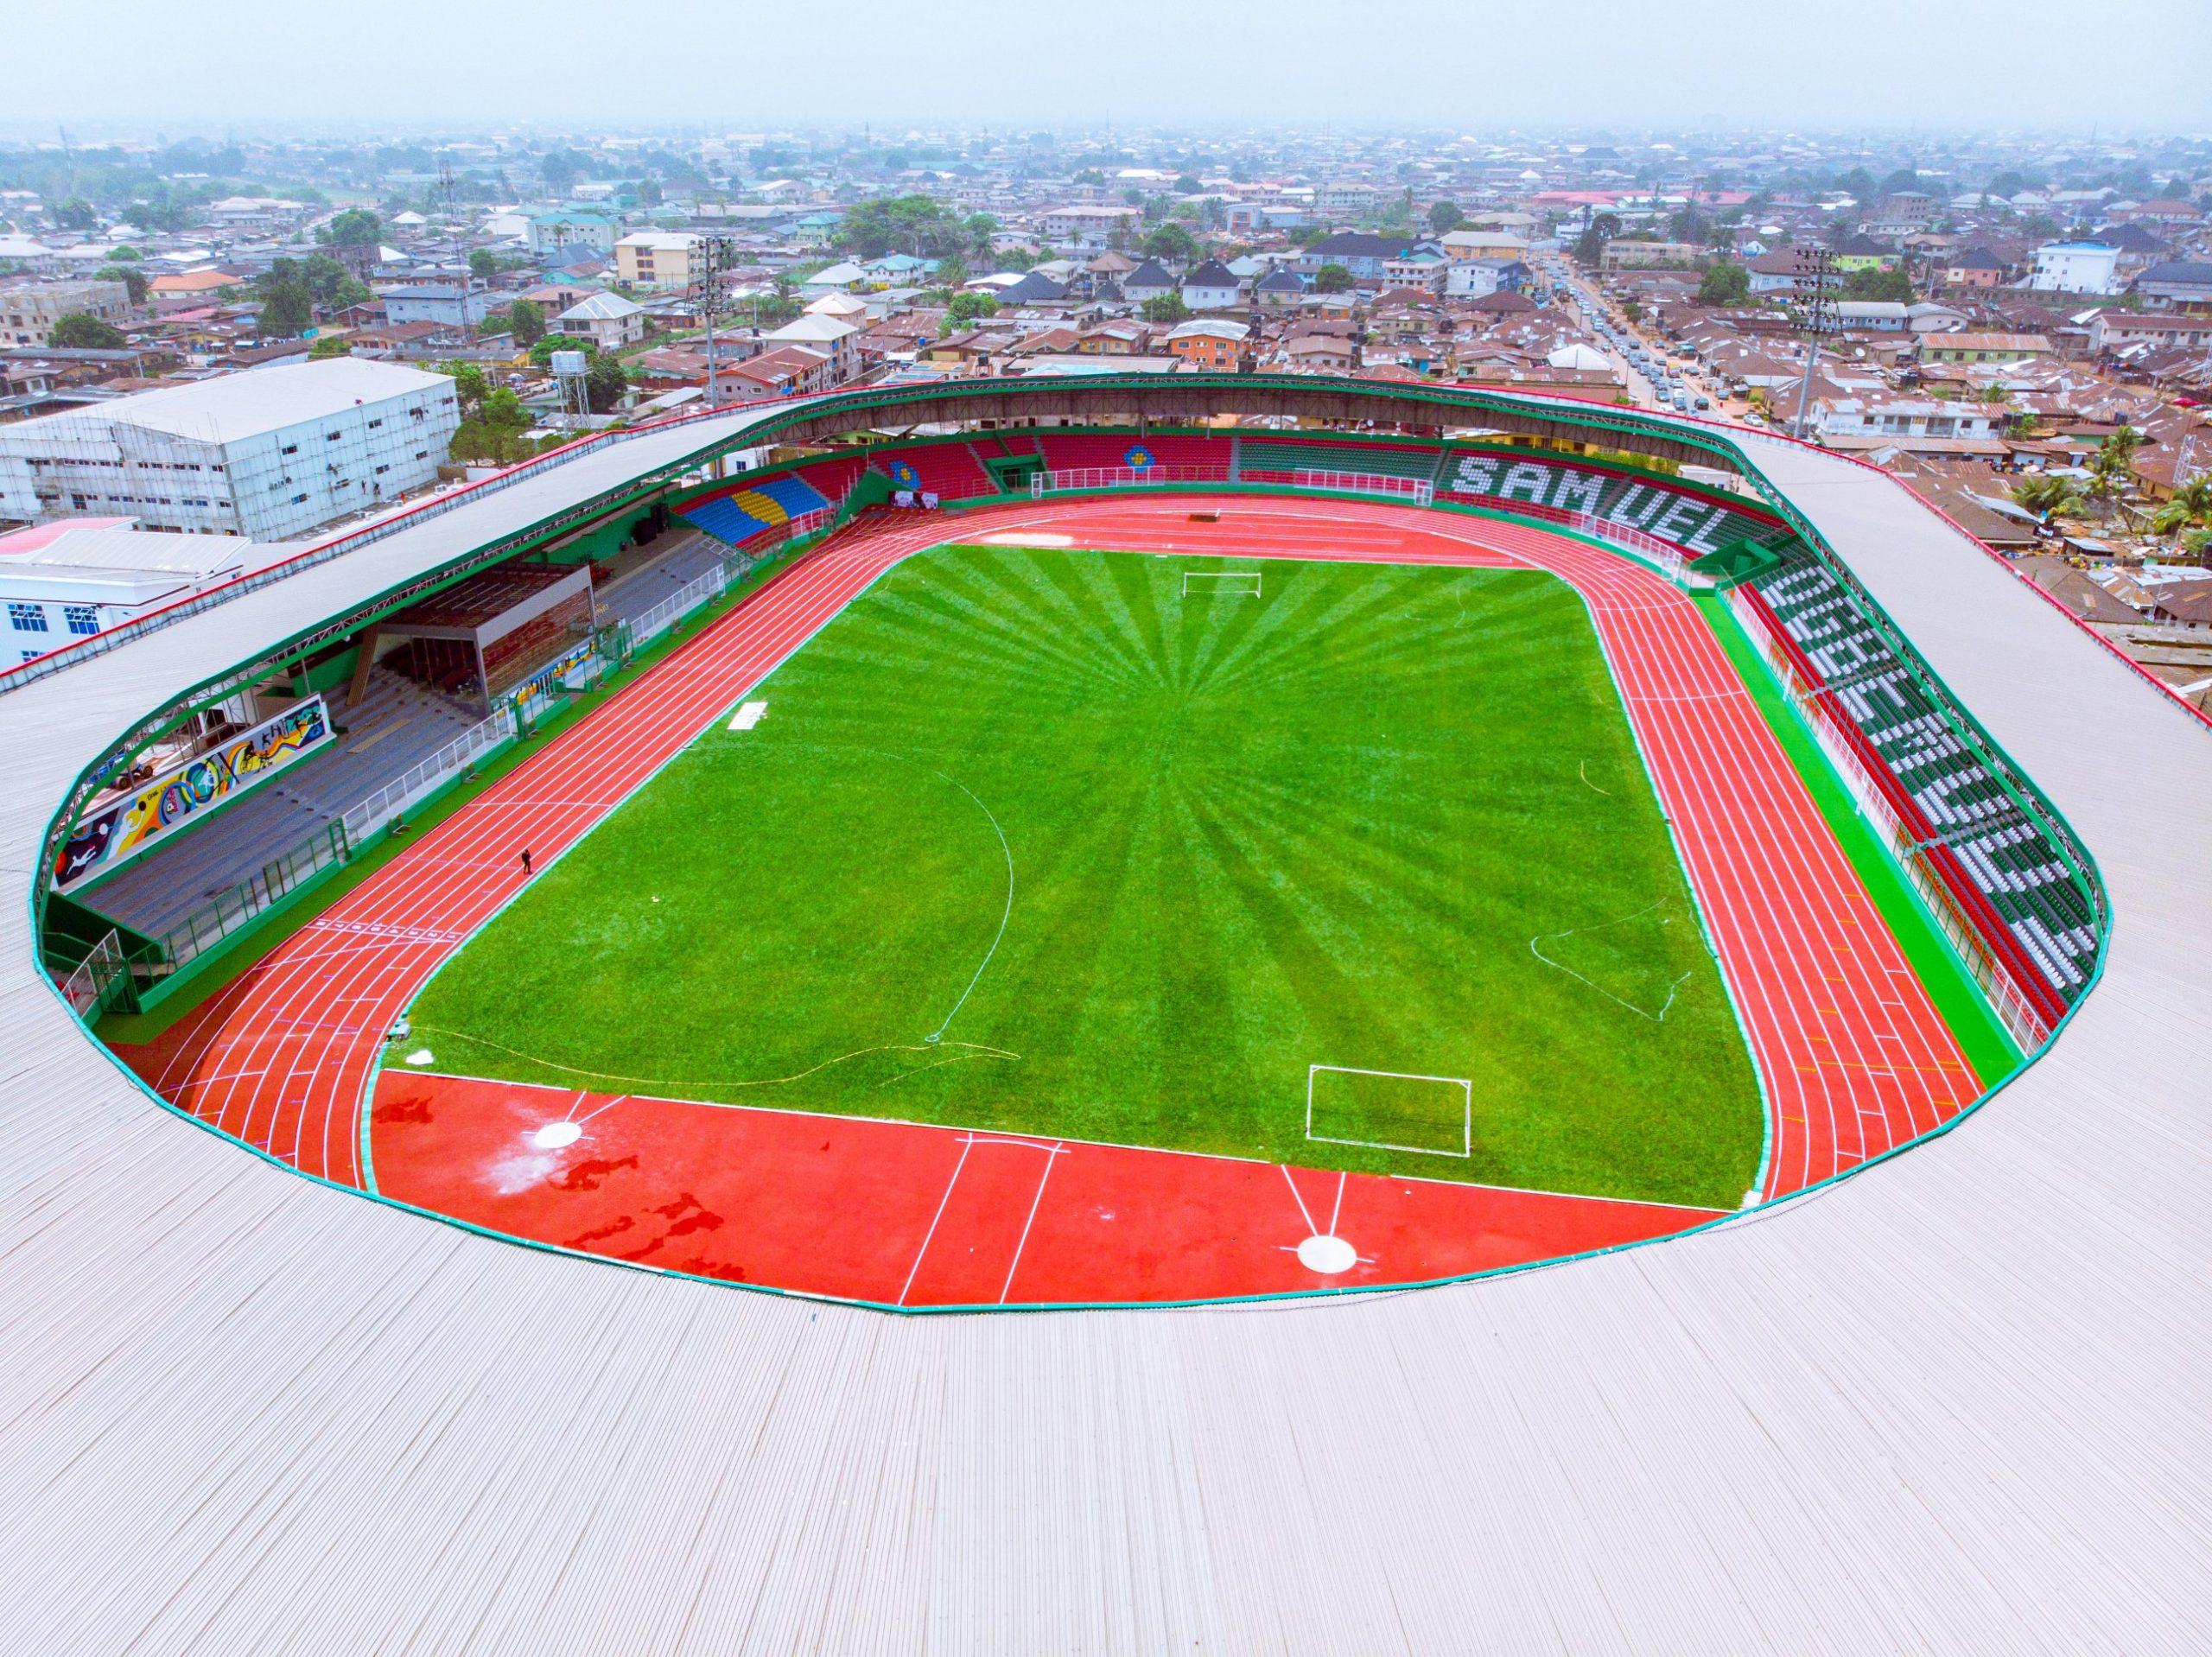 Aerial view of the Samuel Ogbemudia Stadium, Benin City, Edo State.